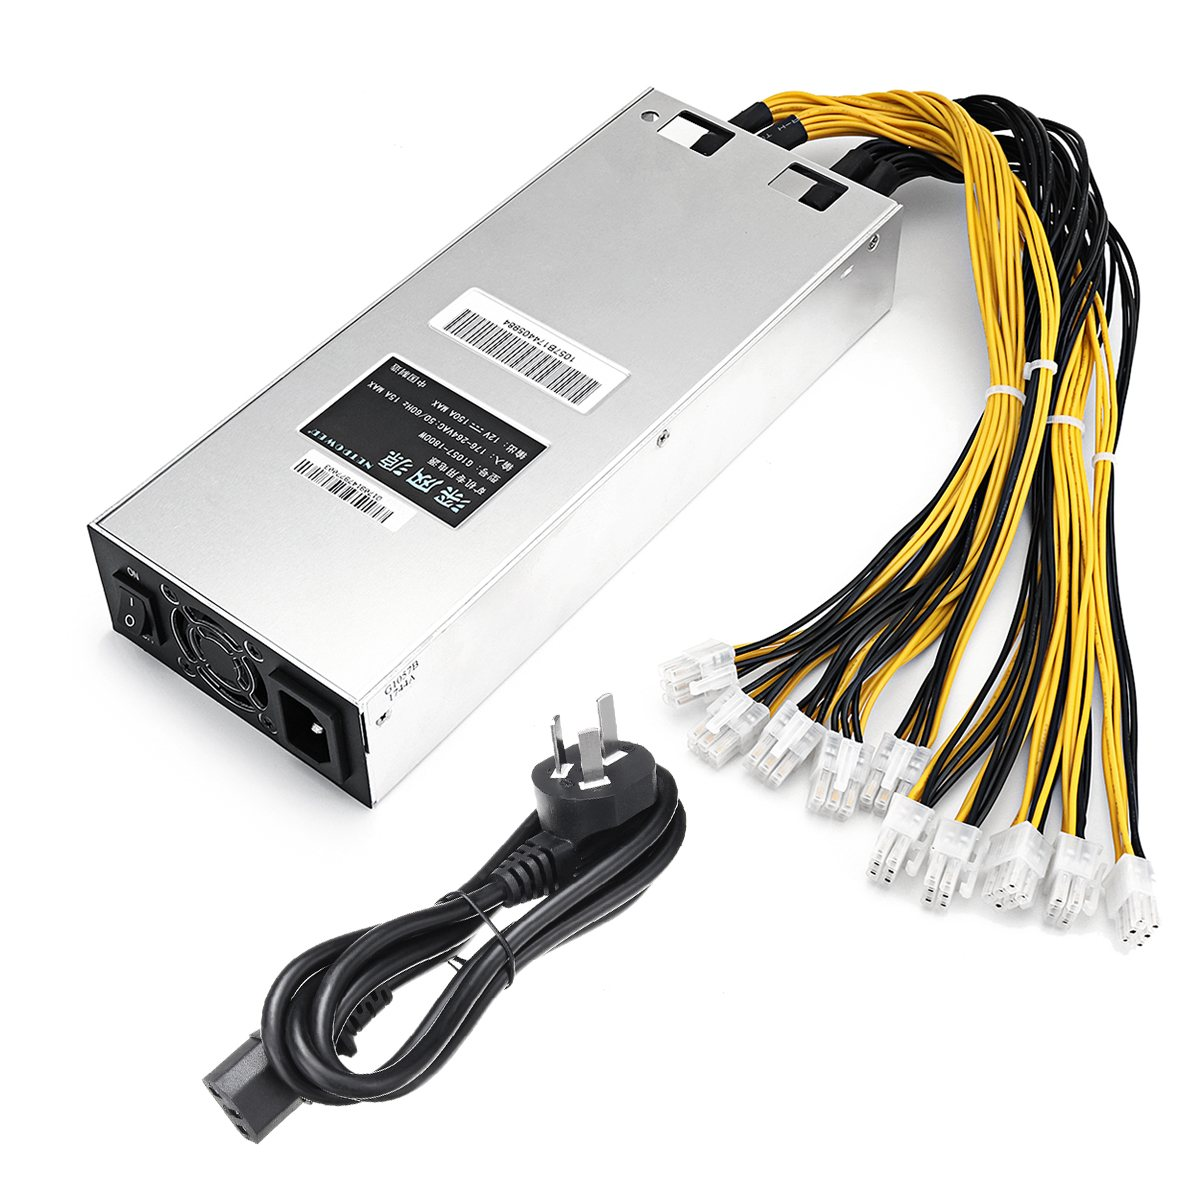 New 1800W Special Power Supplys